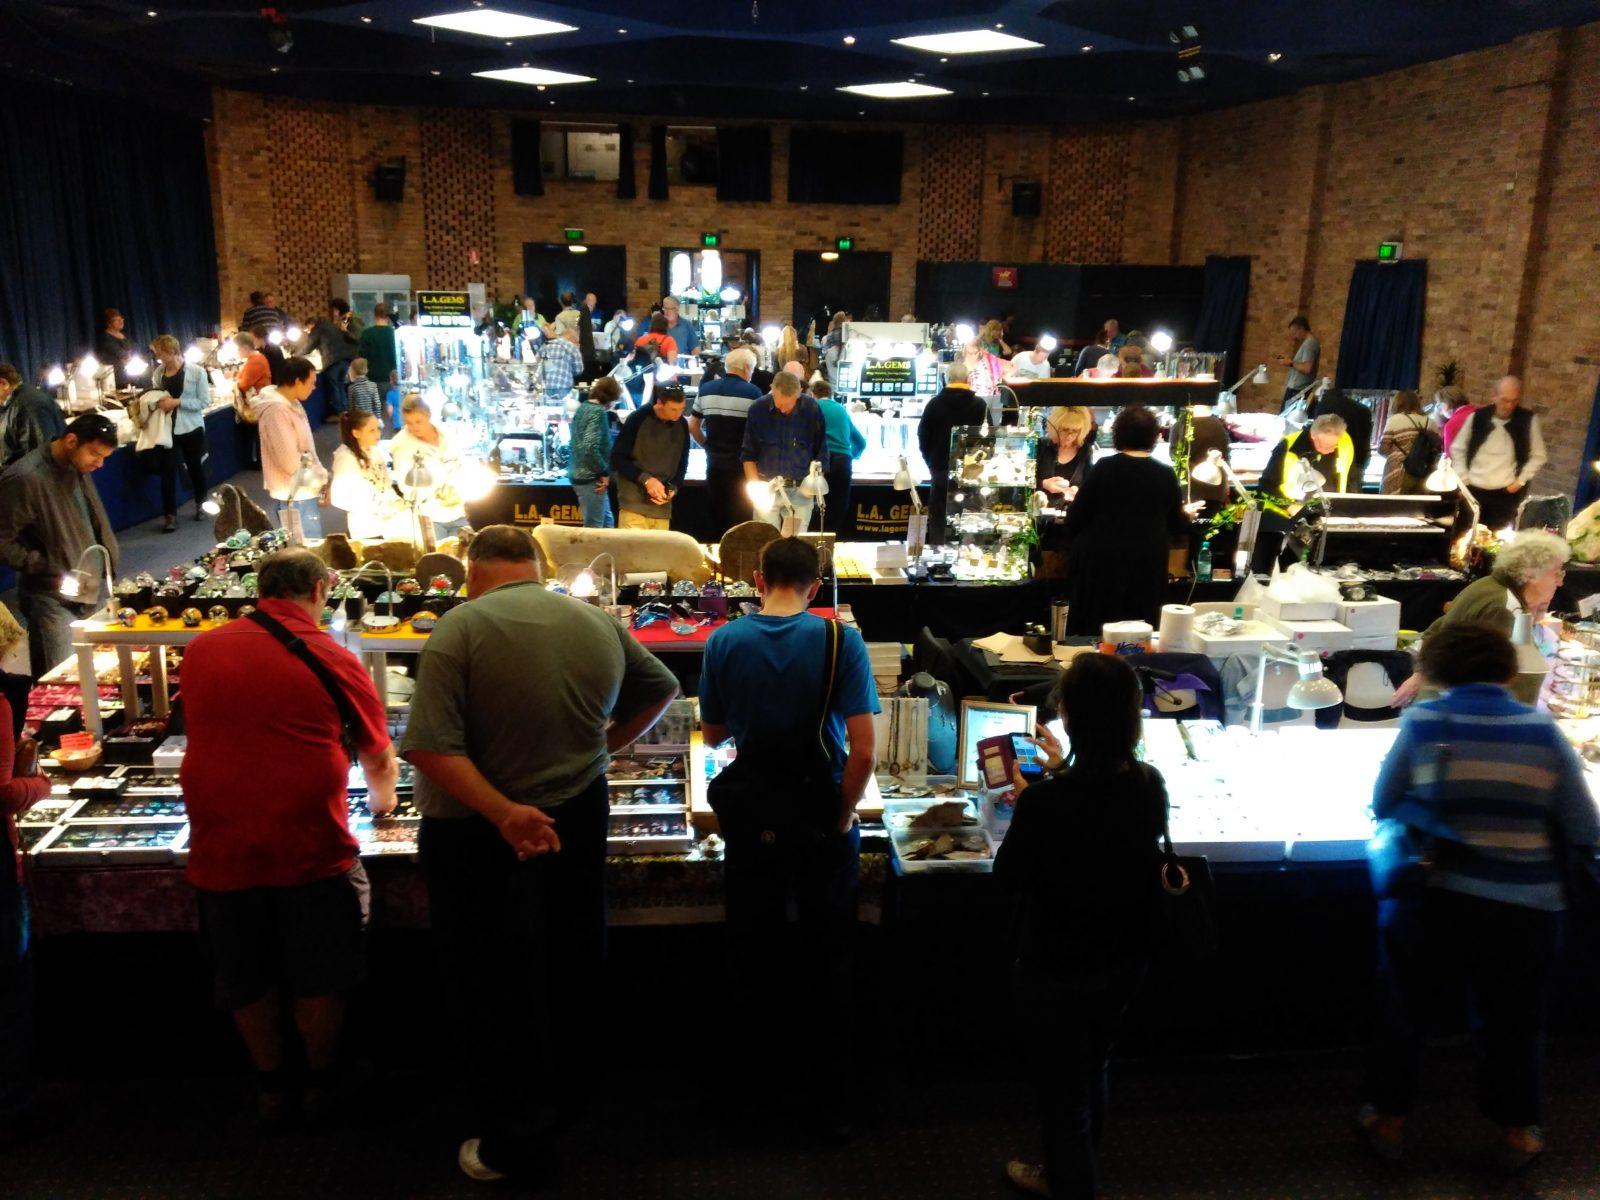 Hawksbury Valley Lapidary Club, jewellery, gems, fossils, minerals